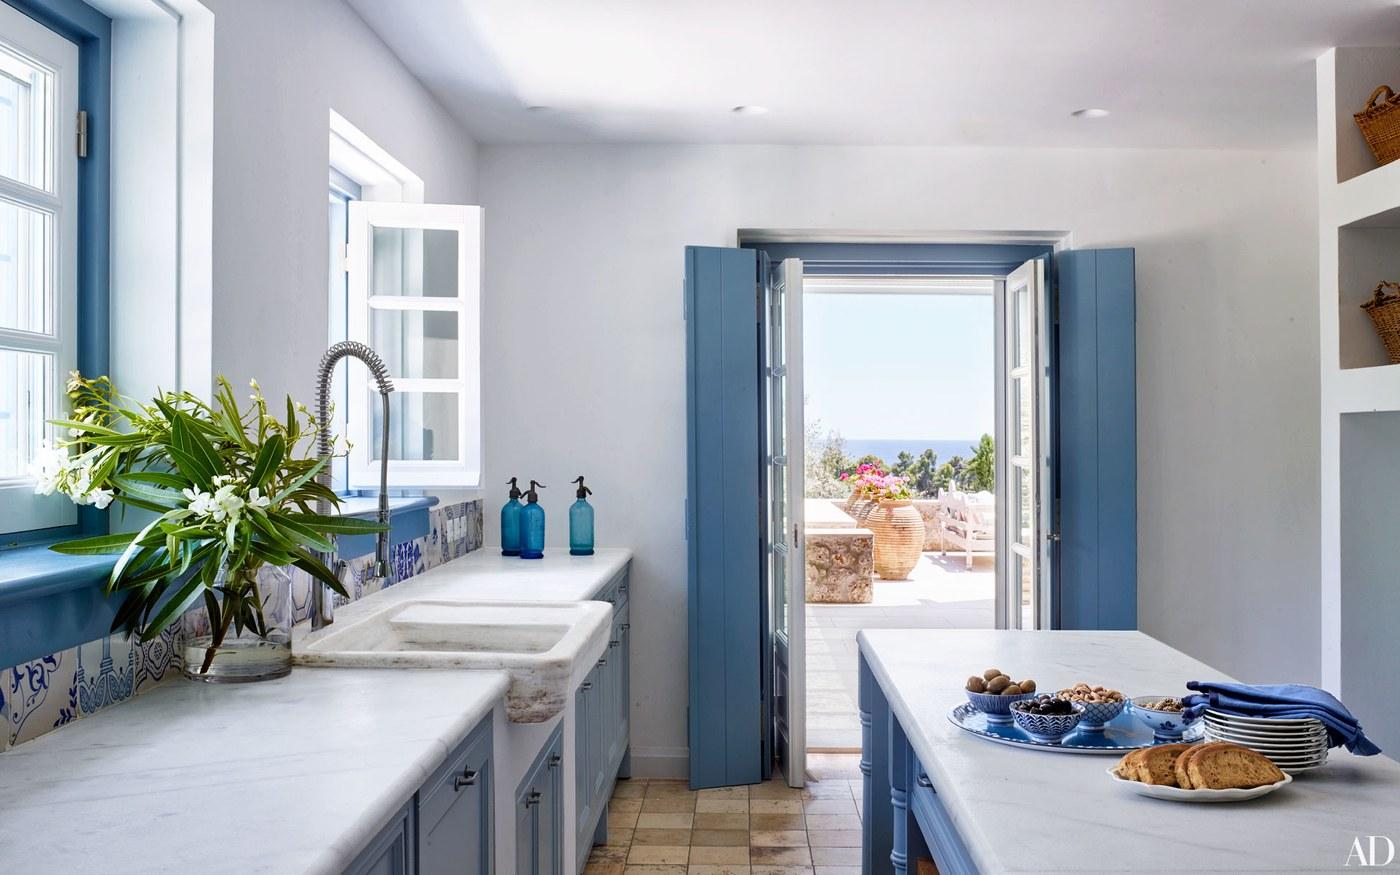 5-visita-guiada-casa-de-ferias-grega-investe-no-azul-claro-praiano